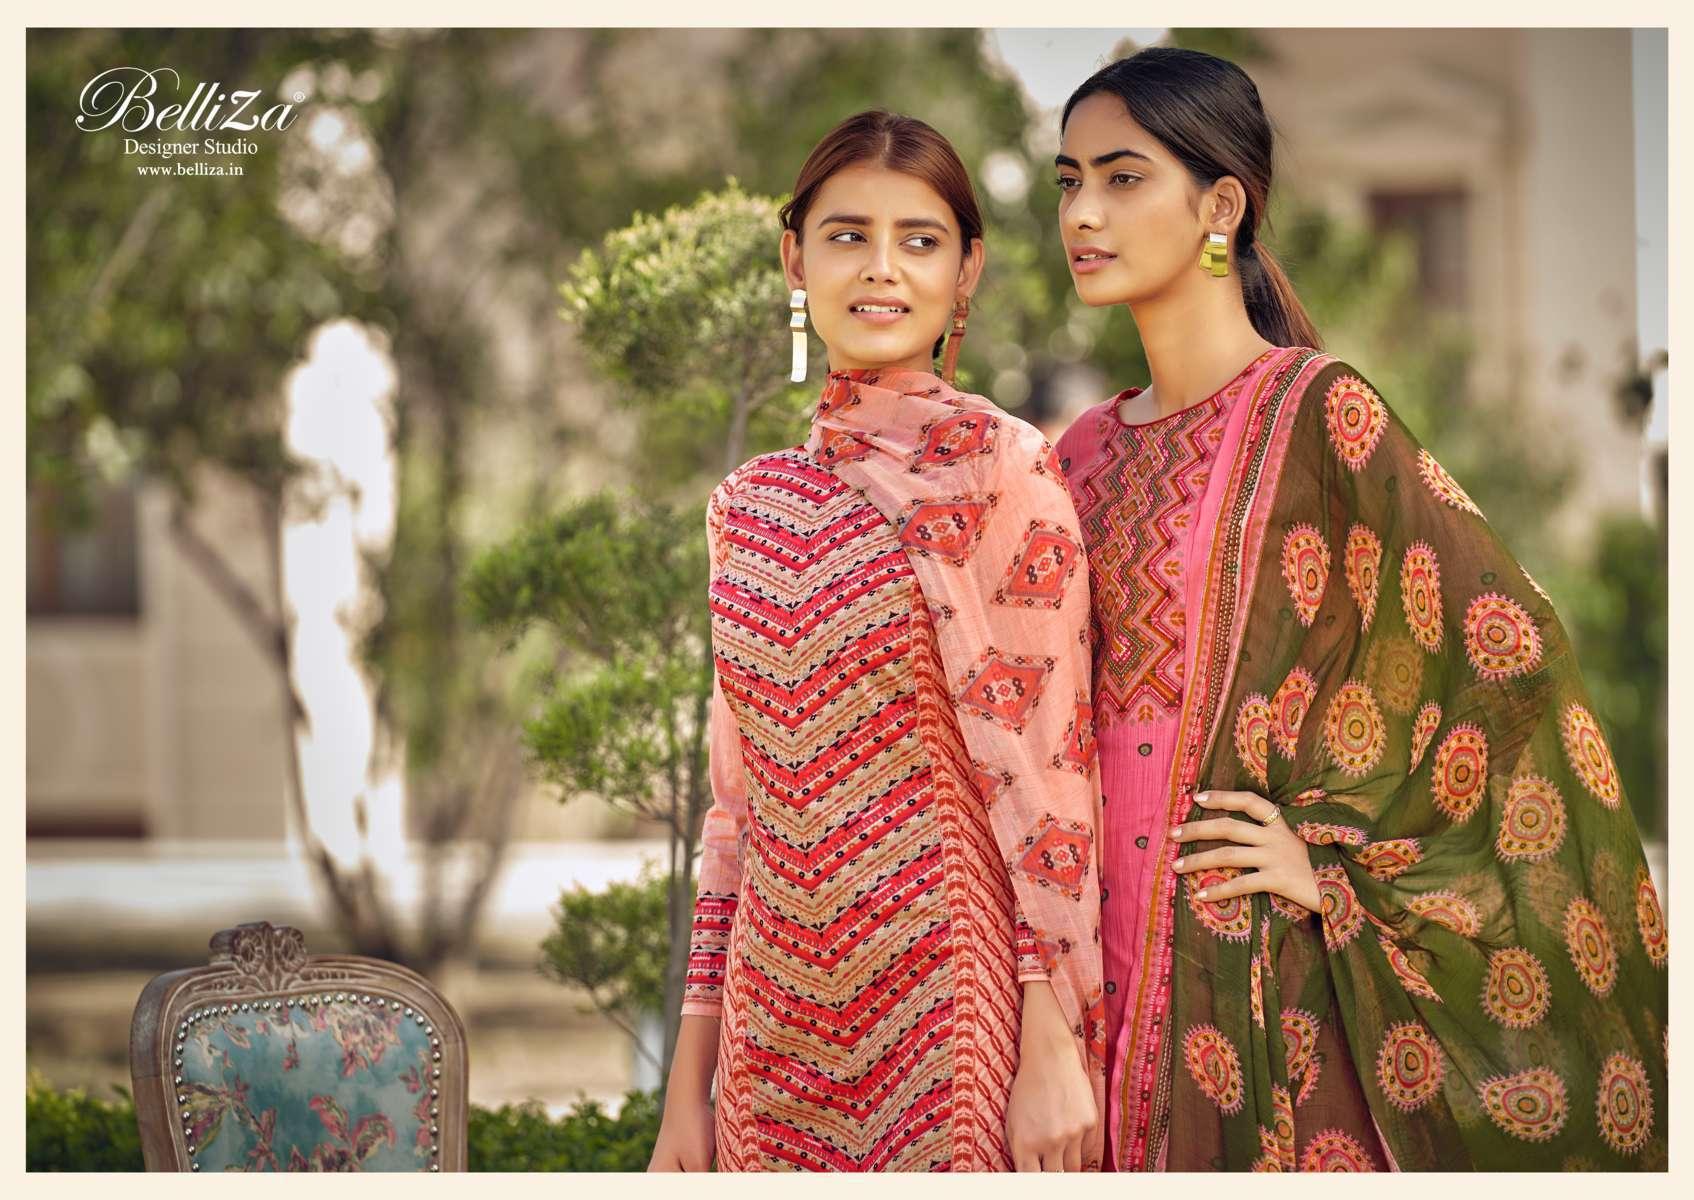 Belliza Melisa Salwar Suit Wholesale Catalog 8 Pcs 6 - Belliza Melisa Salwar Suit Wholesale Catalog 8 Pcs